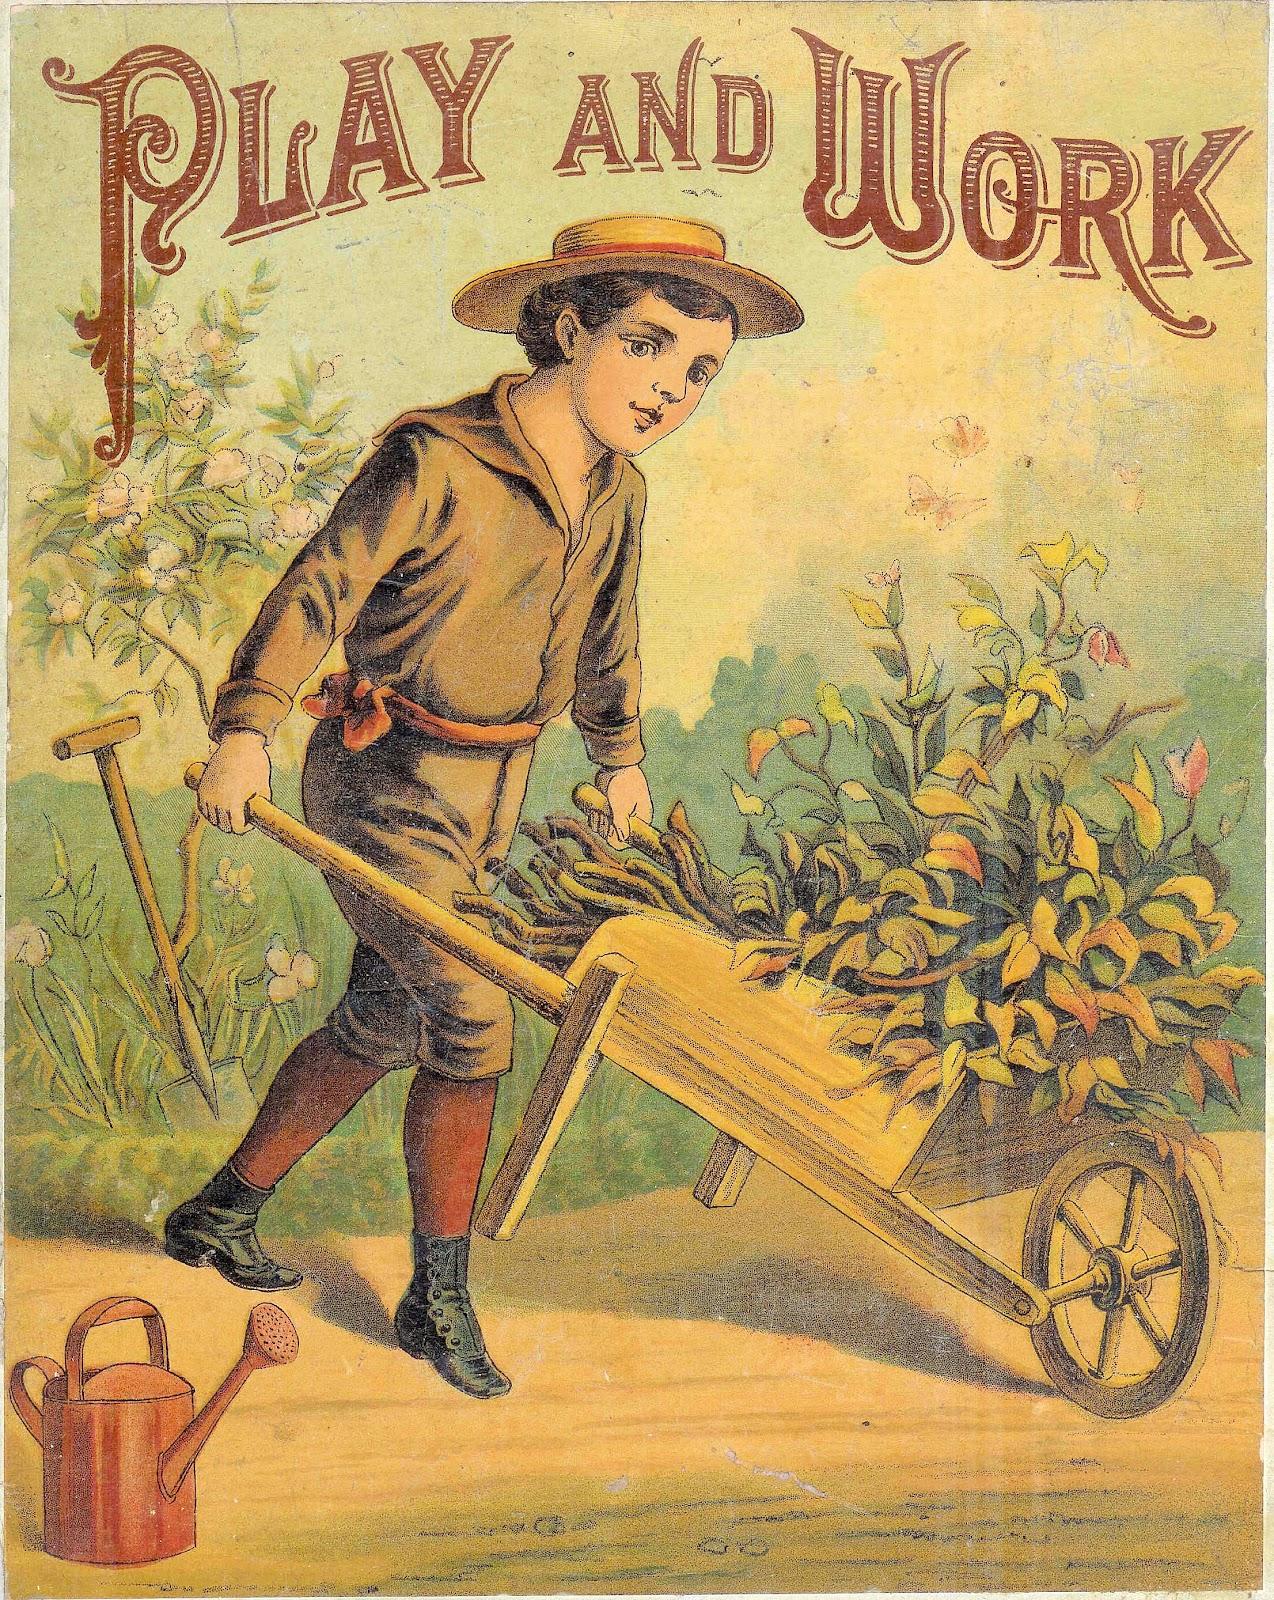 Vintage Children S Book Cover Art ~ Antique images february